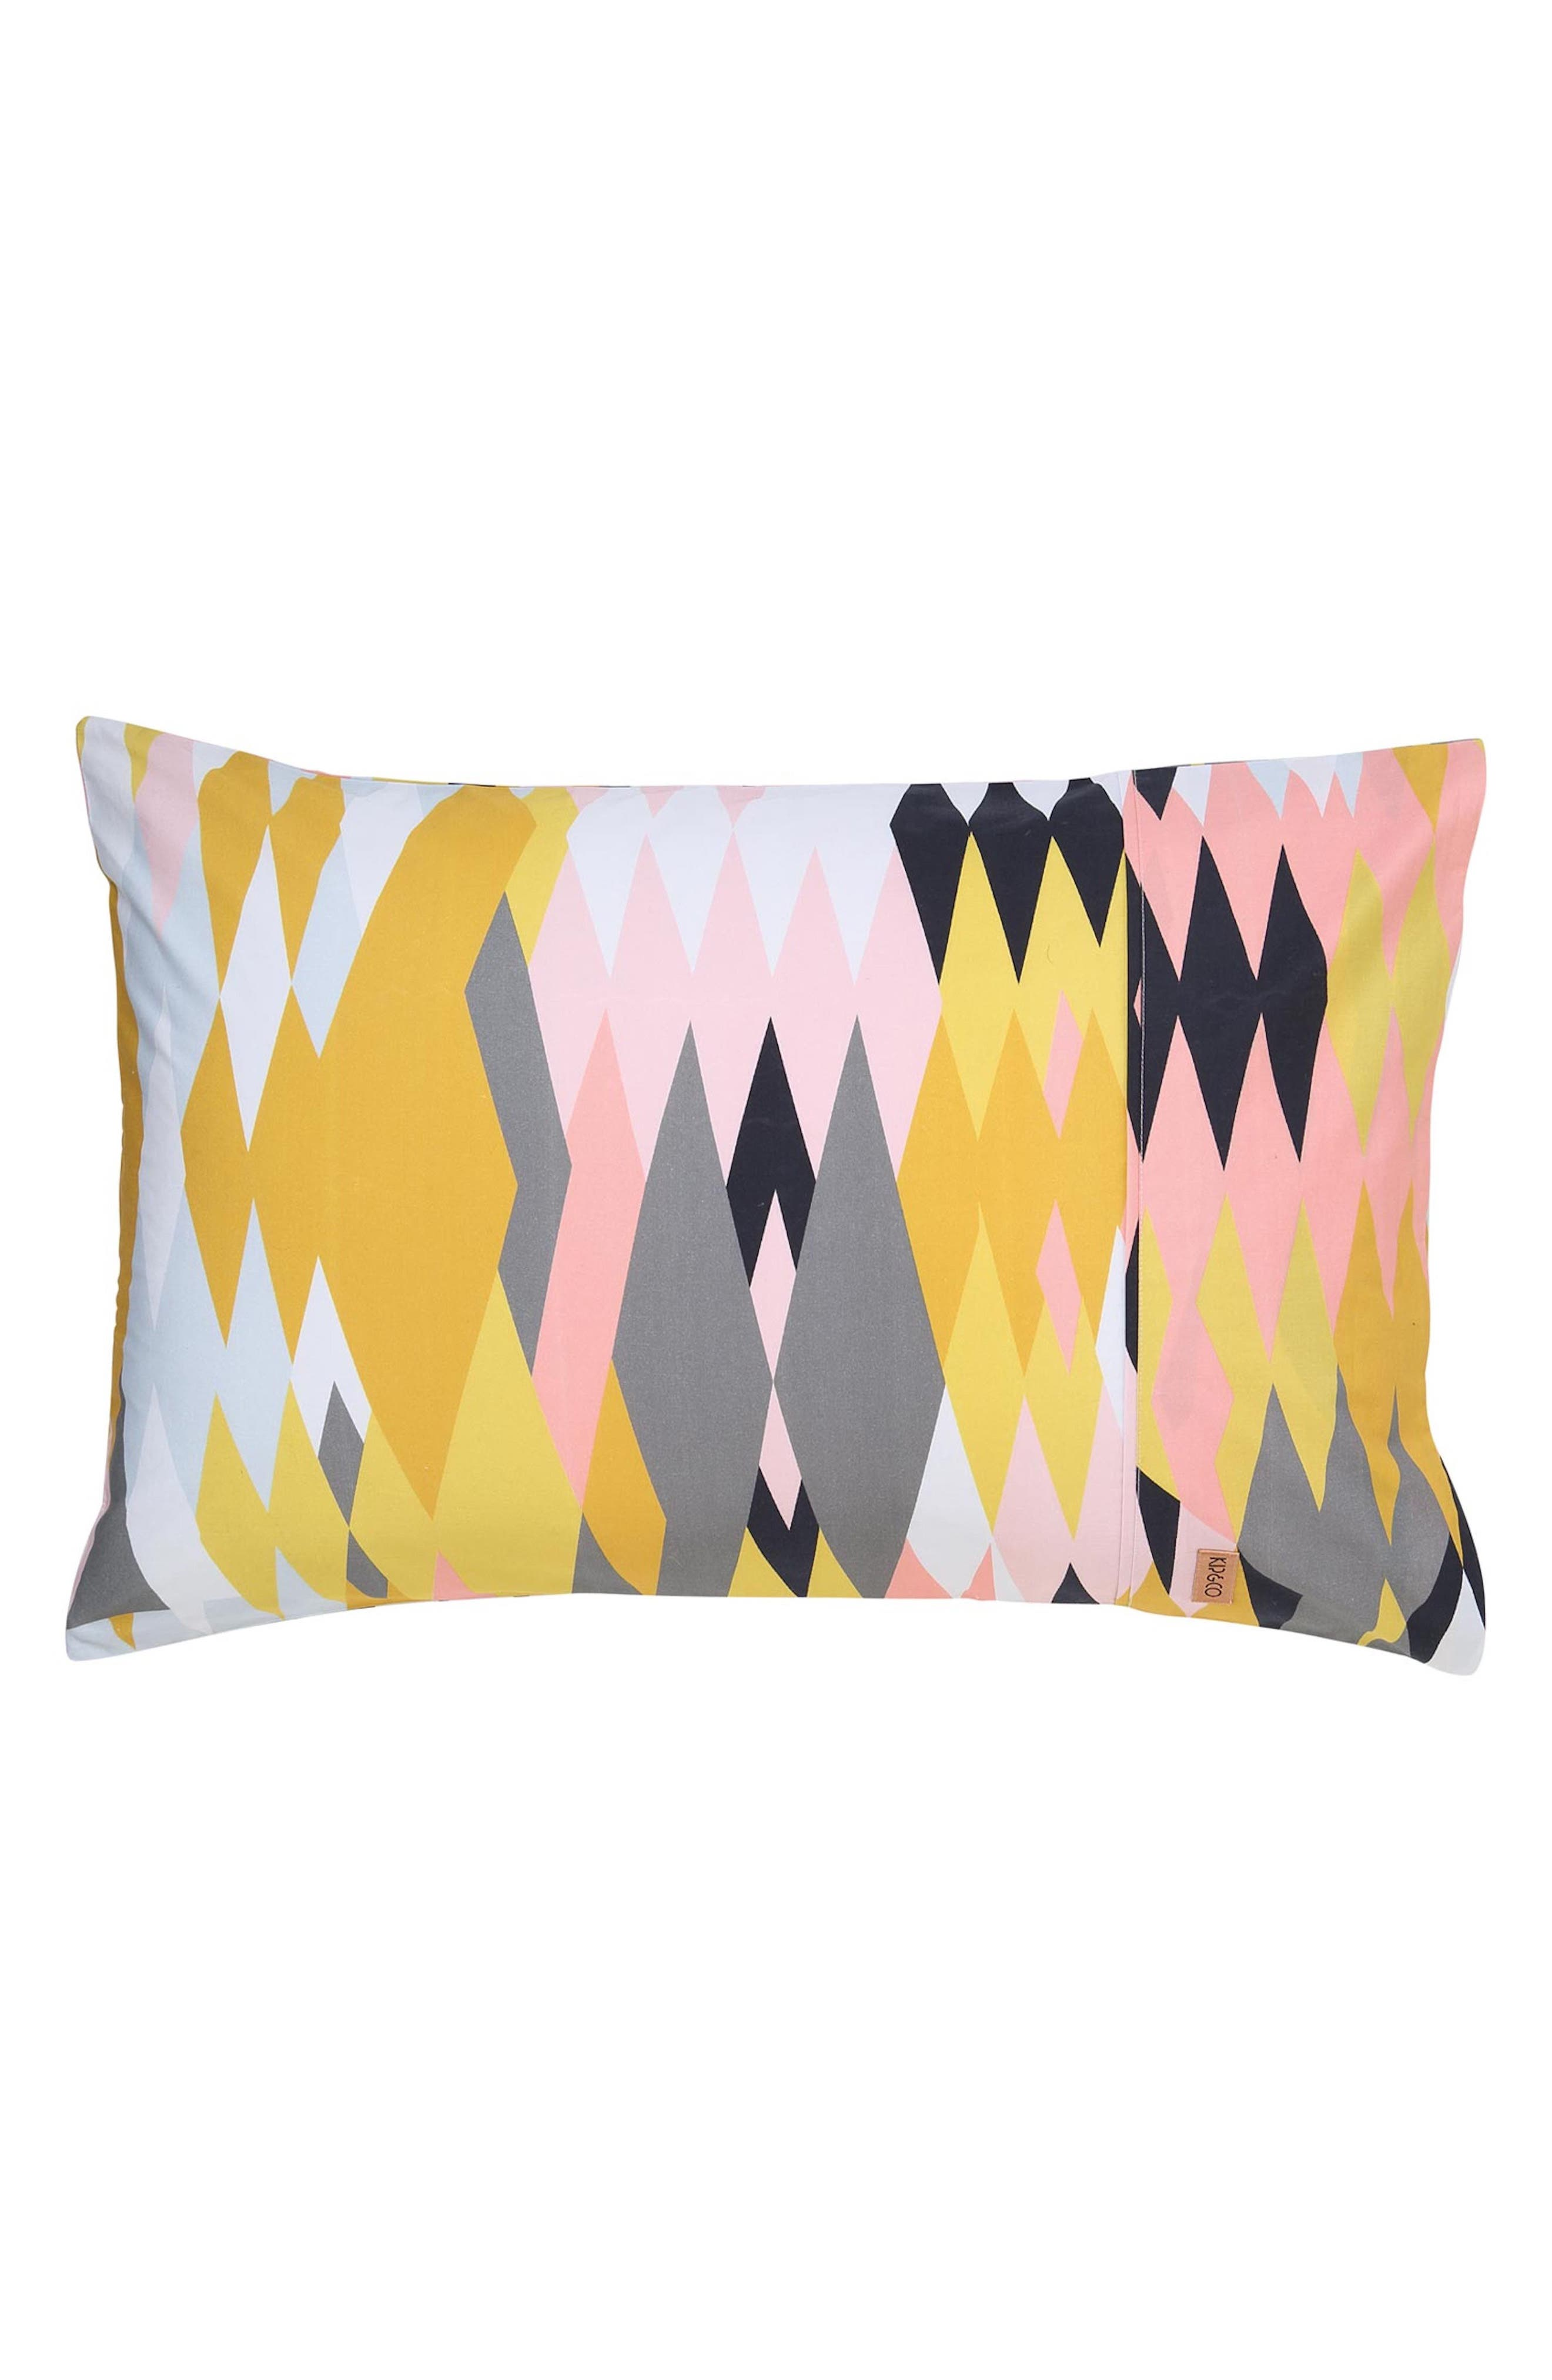 Croc Desert Cotton Pillowcase,                         Main,                         color, Multi